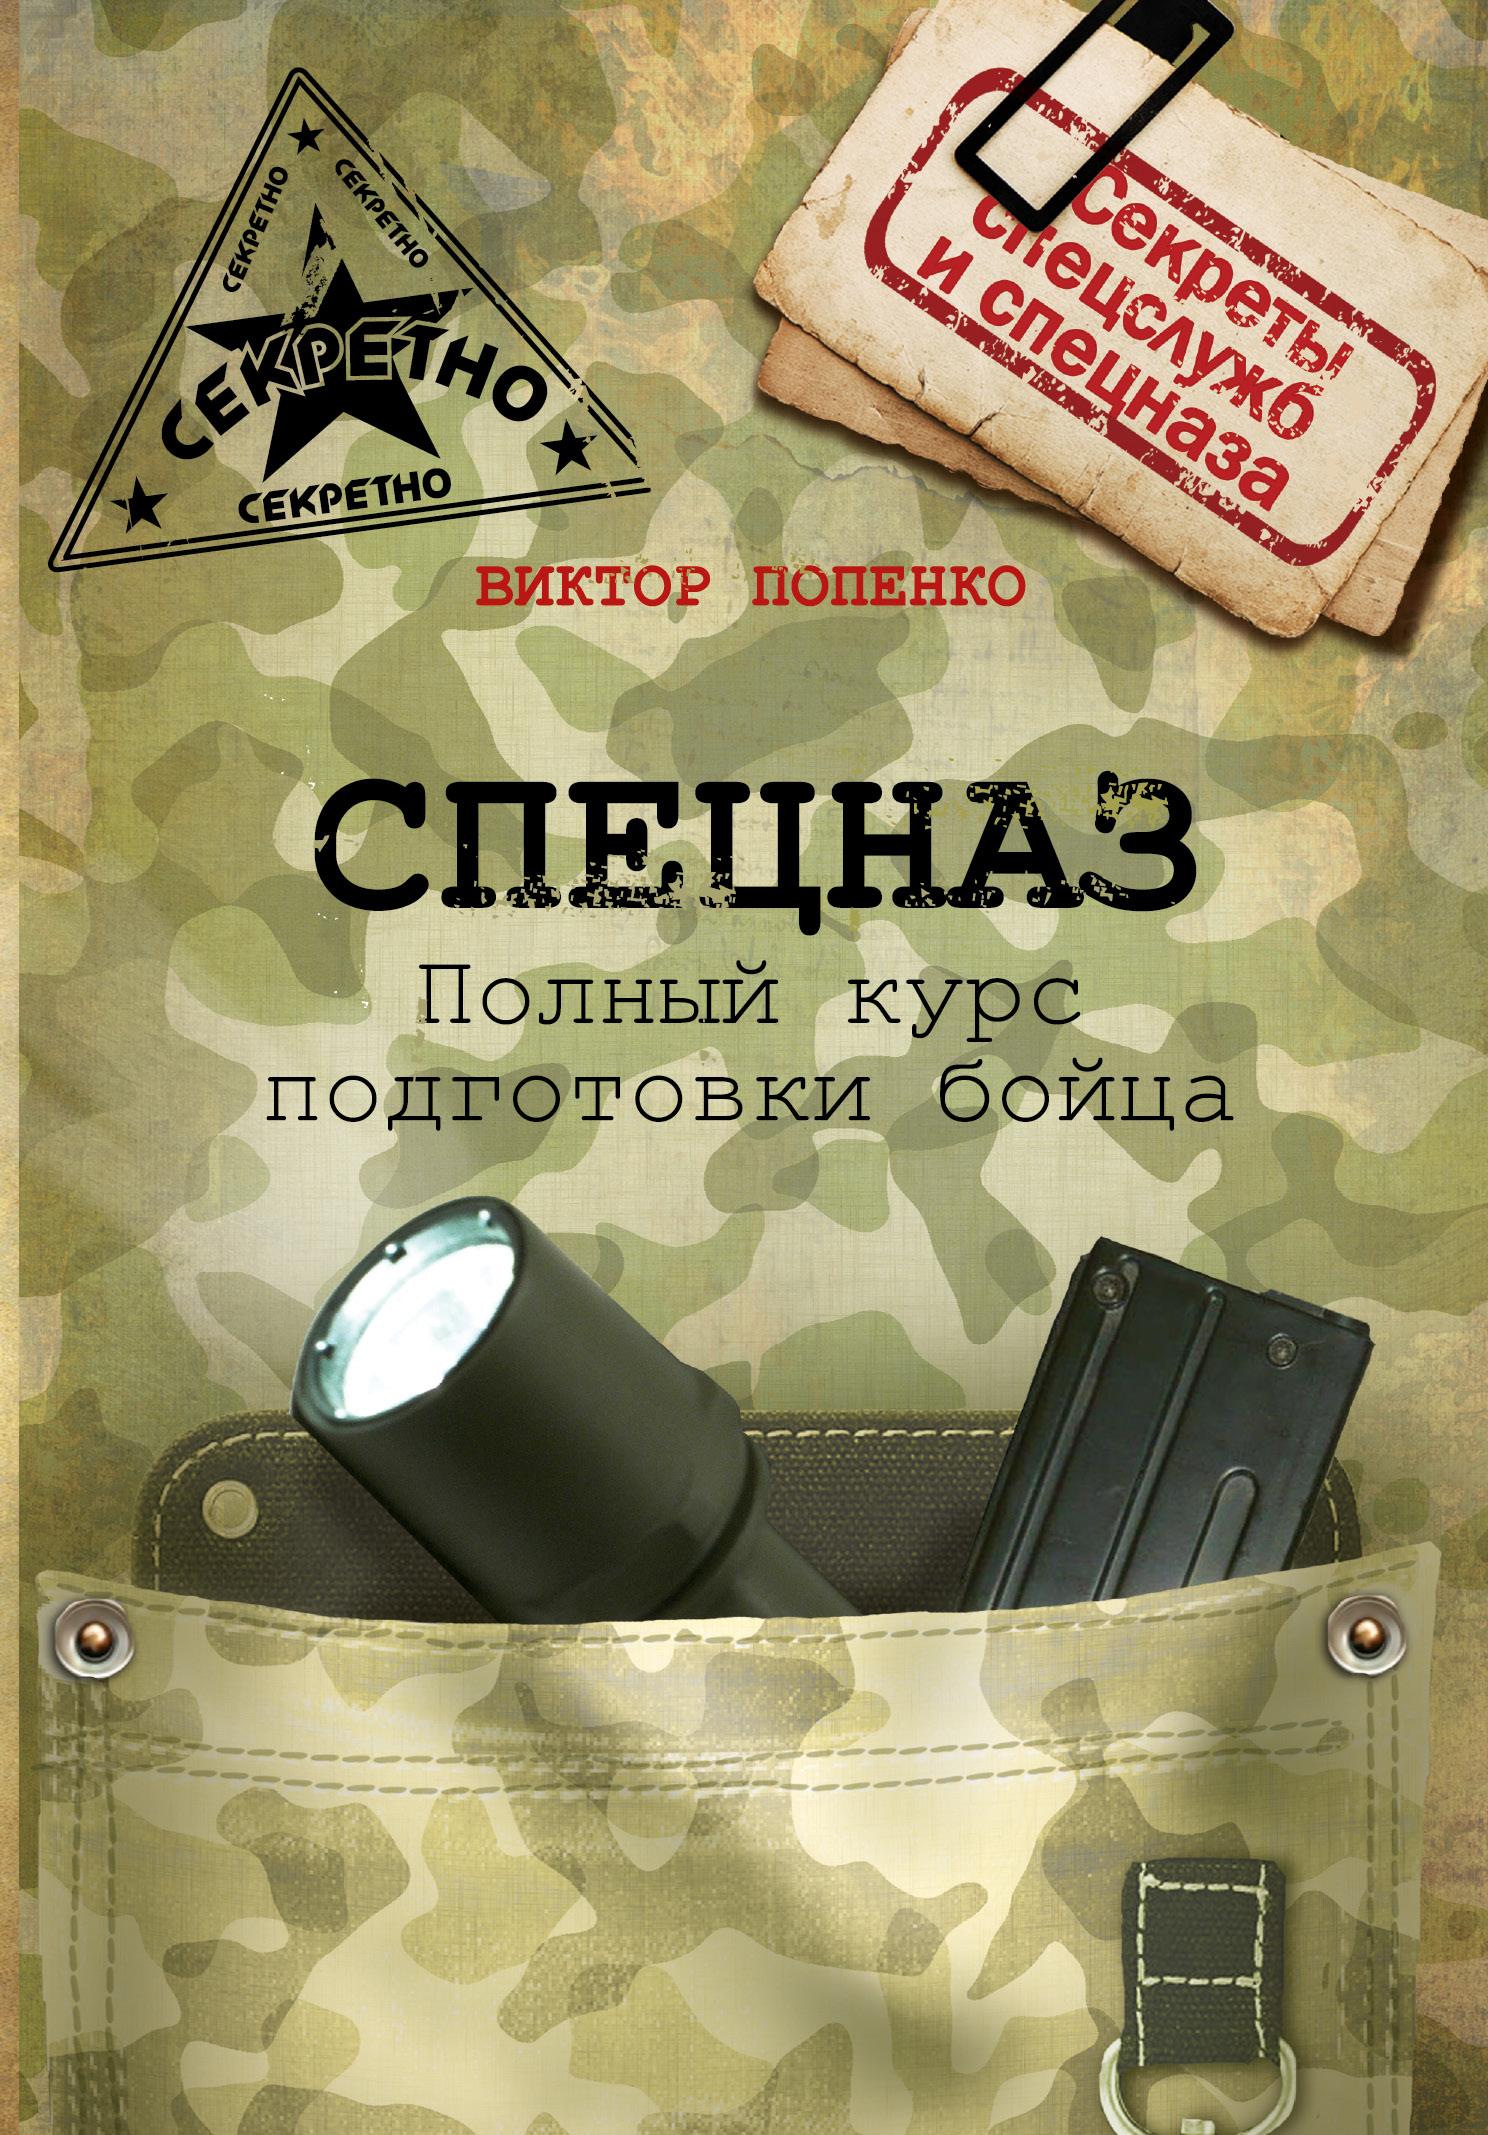 Спецназ. Школа выживания и подготовка бойца ( Попенко В.Н.  )